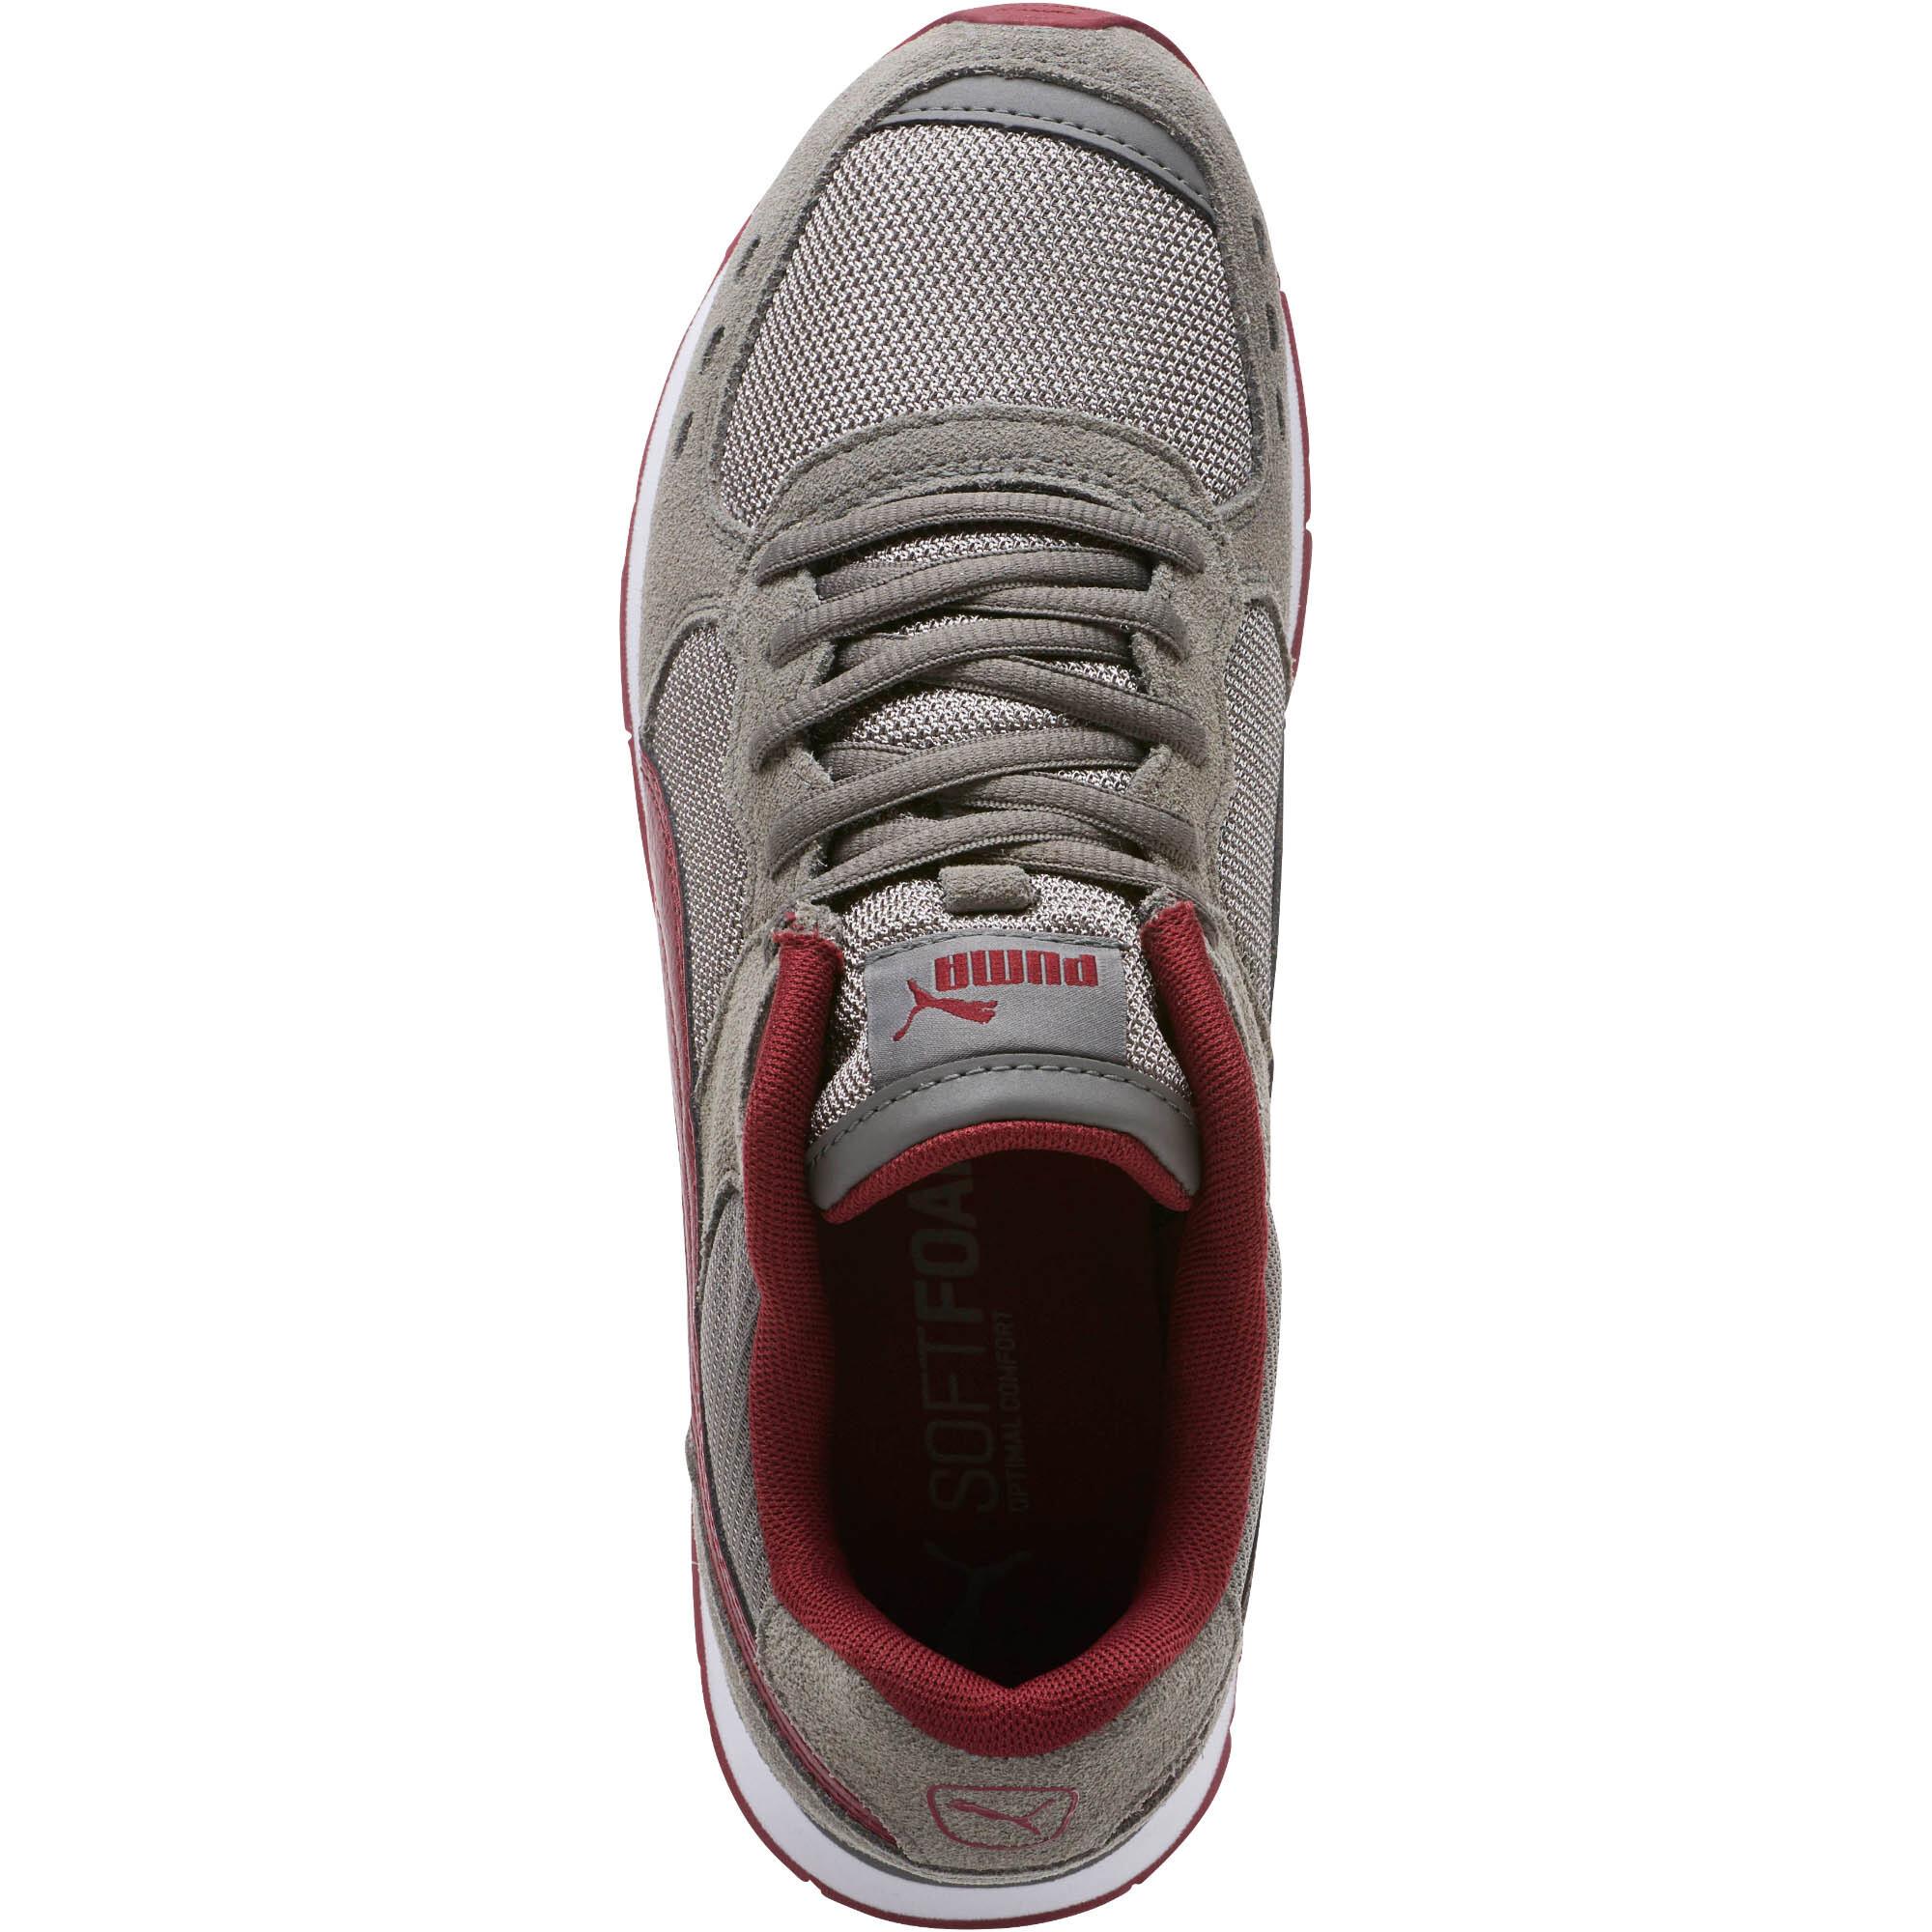 PUMA-Vista-Women-s-Sneakers-Women-Shoe-Basics thumbnail 22